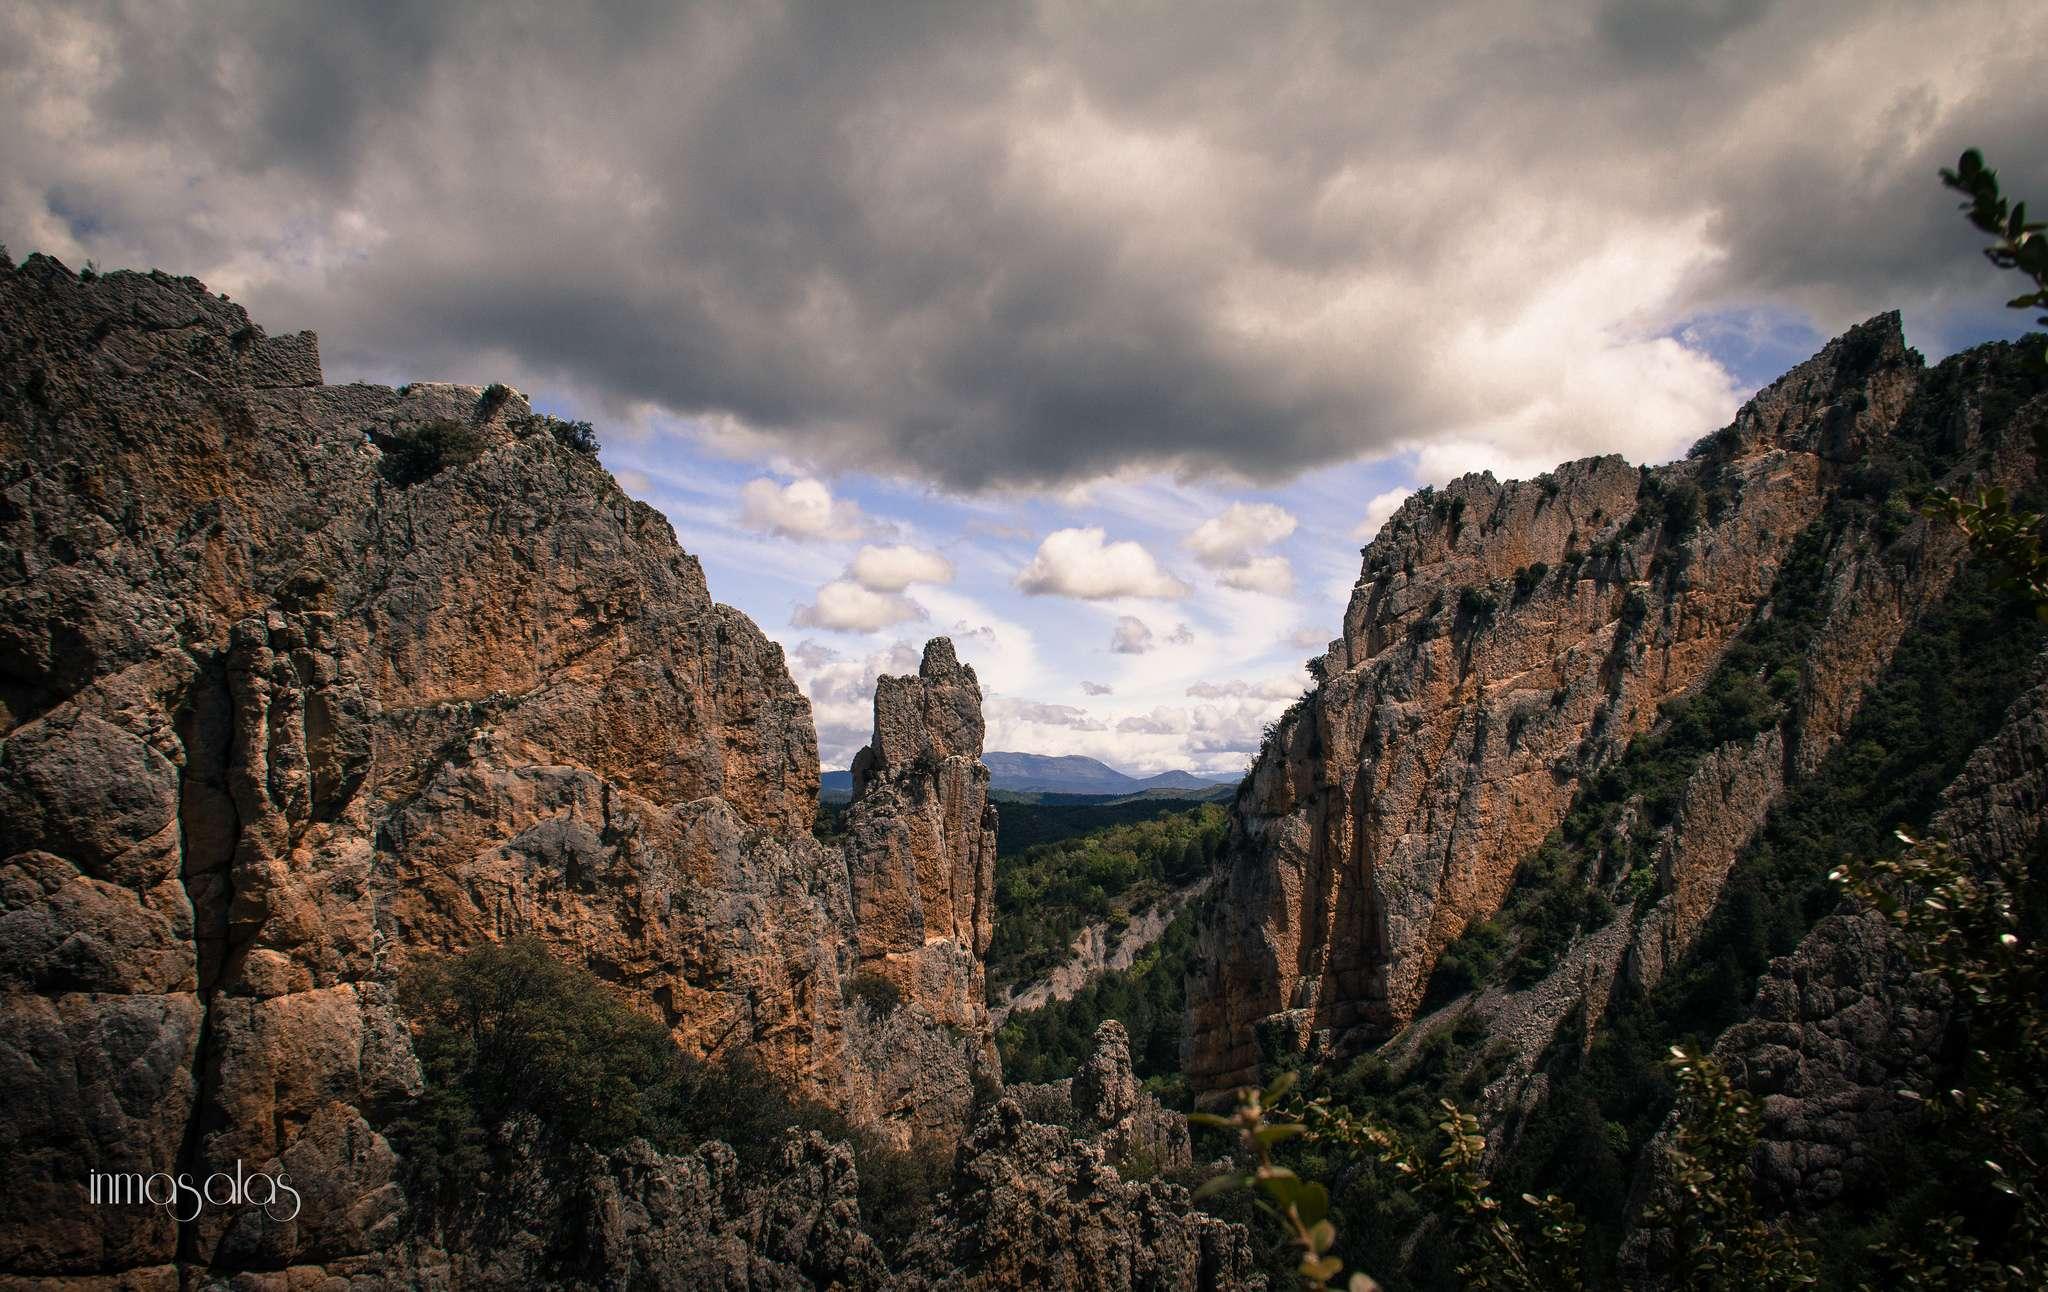 villalangua-camino-a-foz-de-salinas-httpbit-ly2facvjr